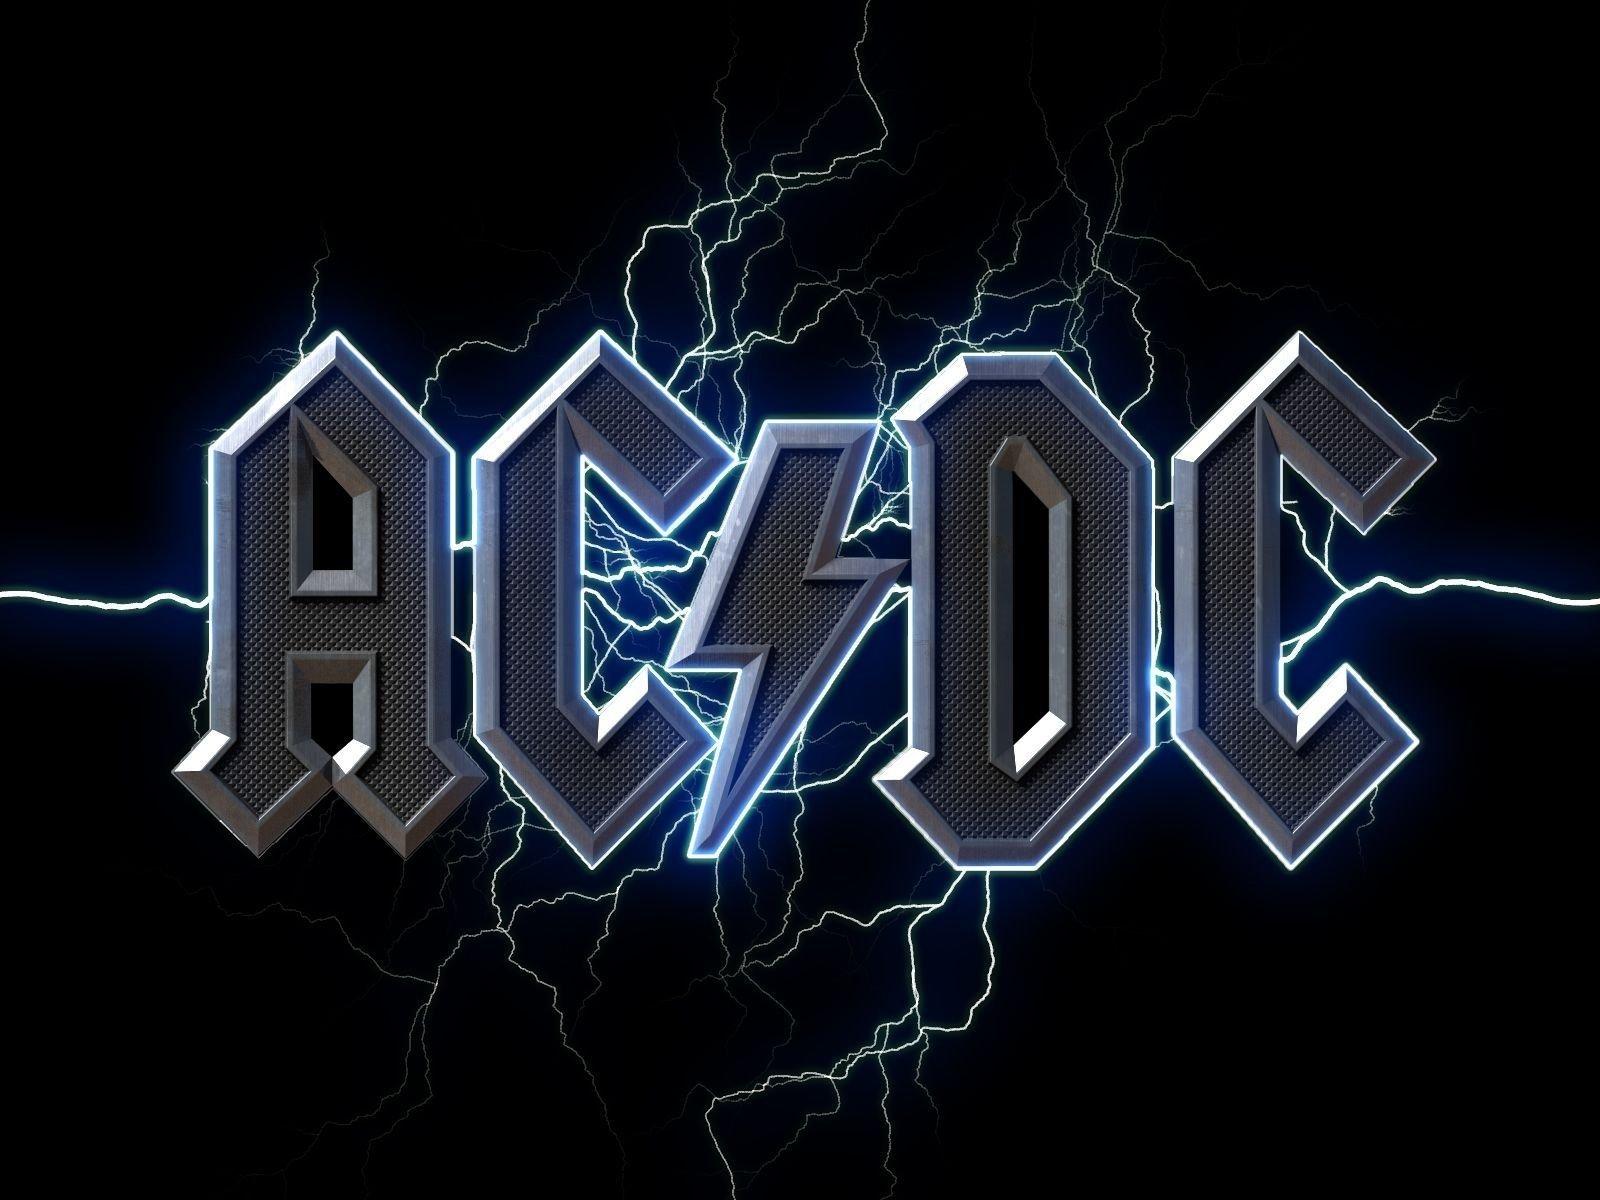 Music - AC/DC  Wallpaper